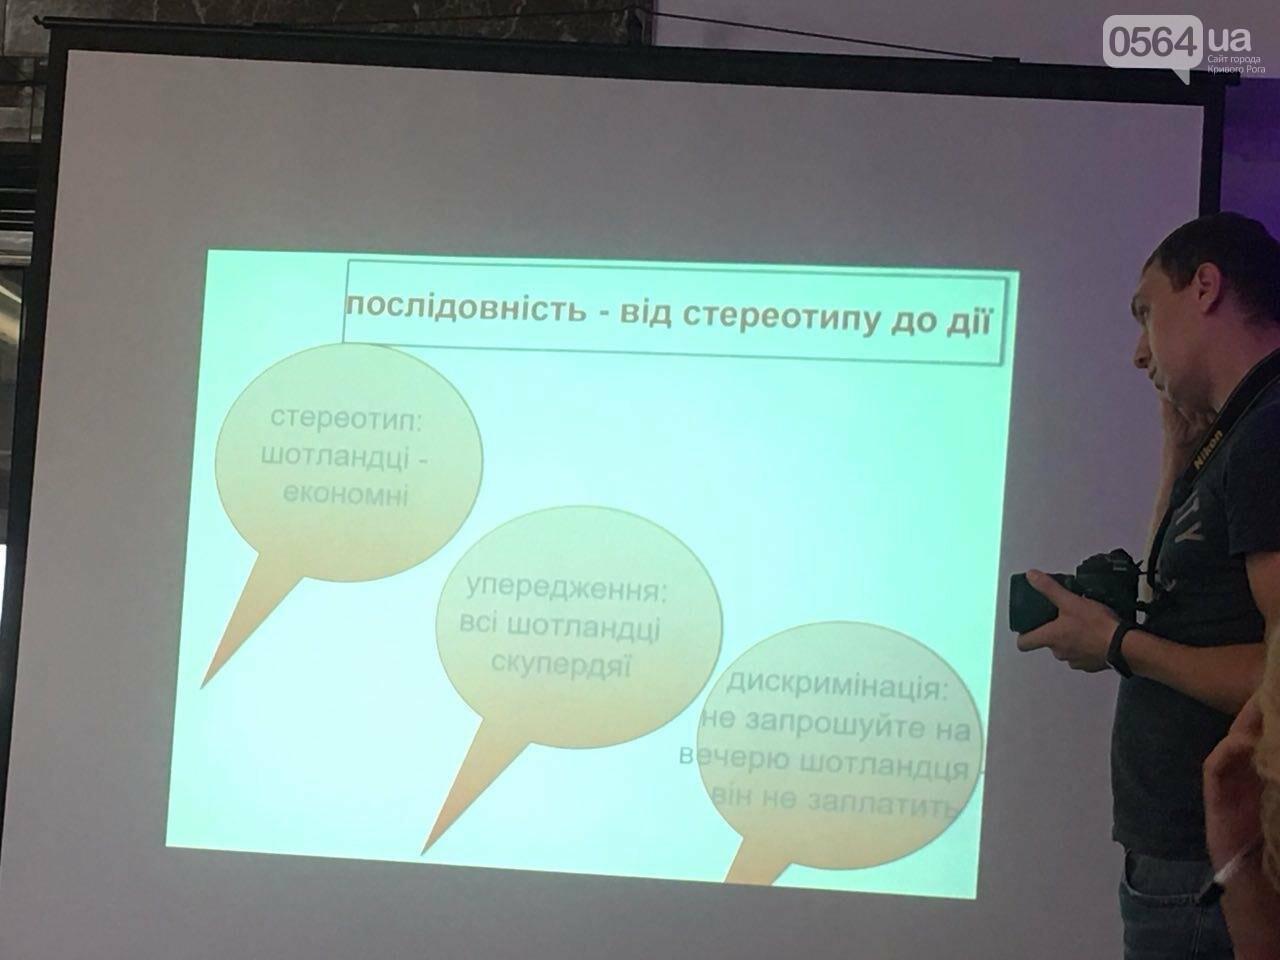 На тренинге о ВИЧ и медреформе криворожским журналистам рассказали о дискриминации и стереотипах, - ФОТО , фото-15